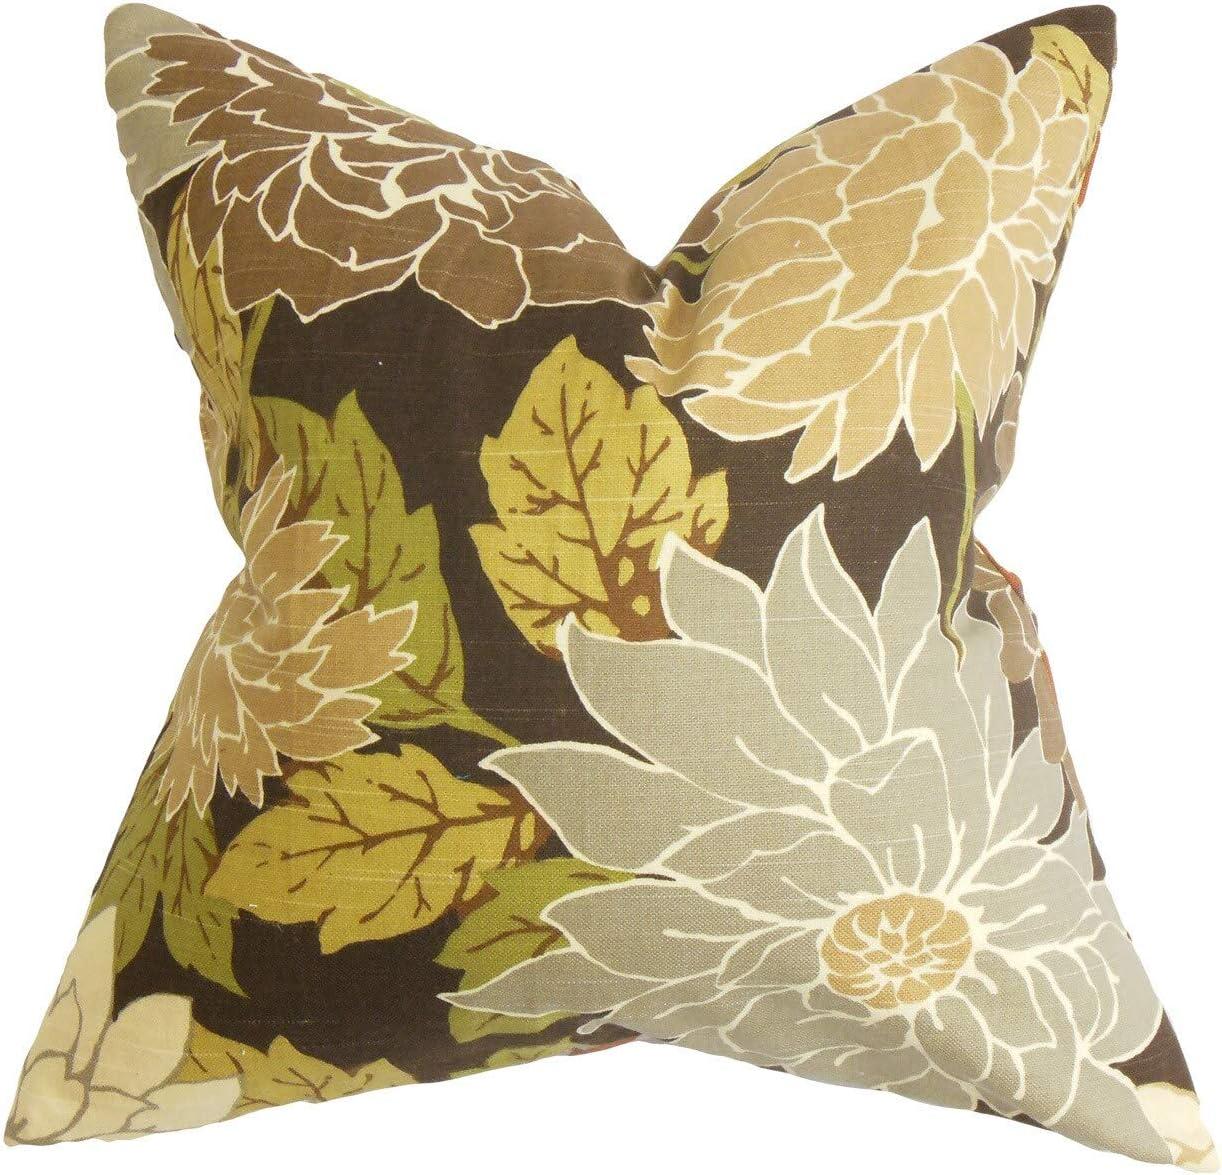 The Pillow Collection Kerensa Floral Throw Pillow Cover